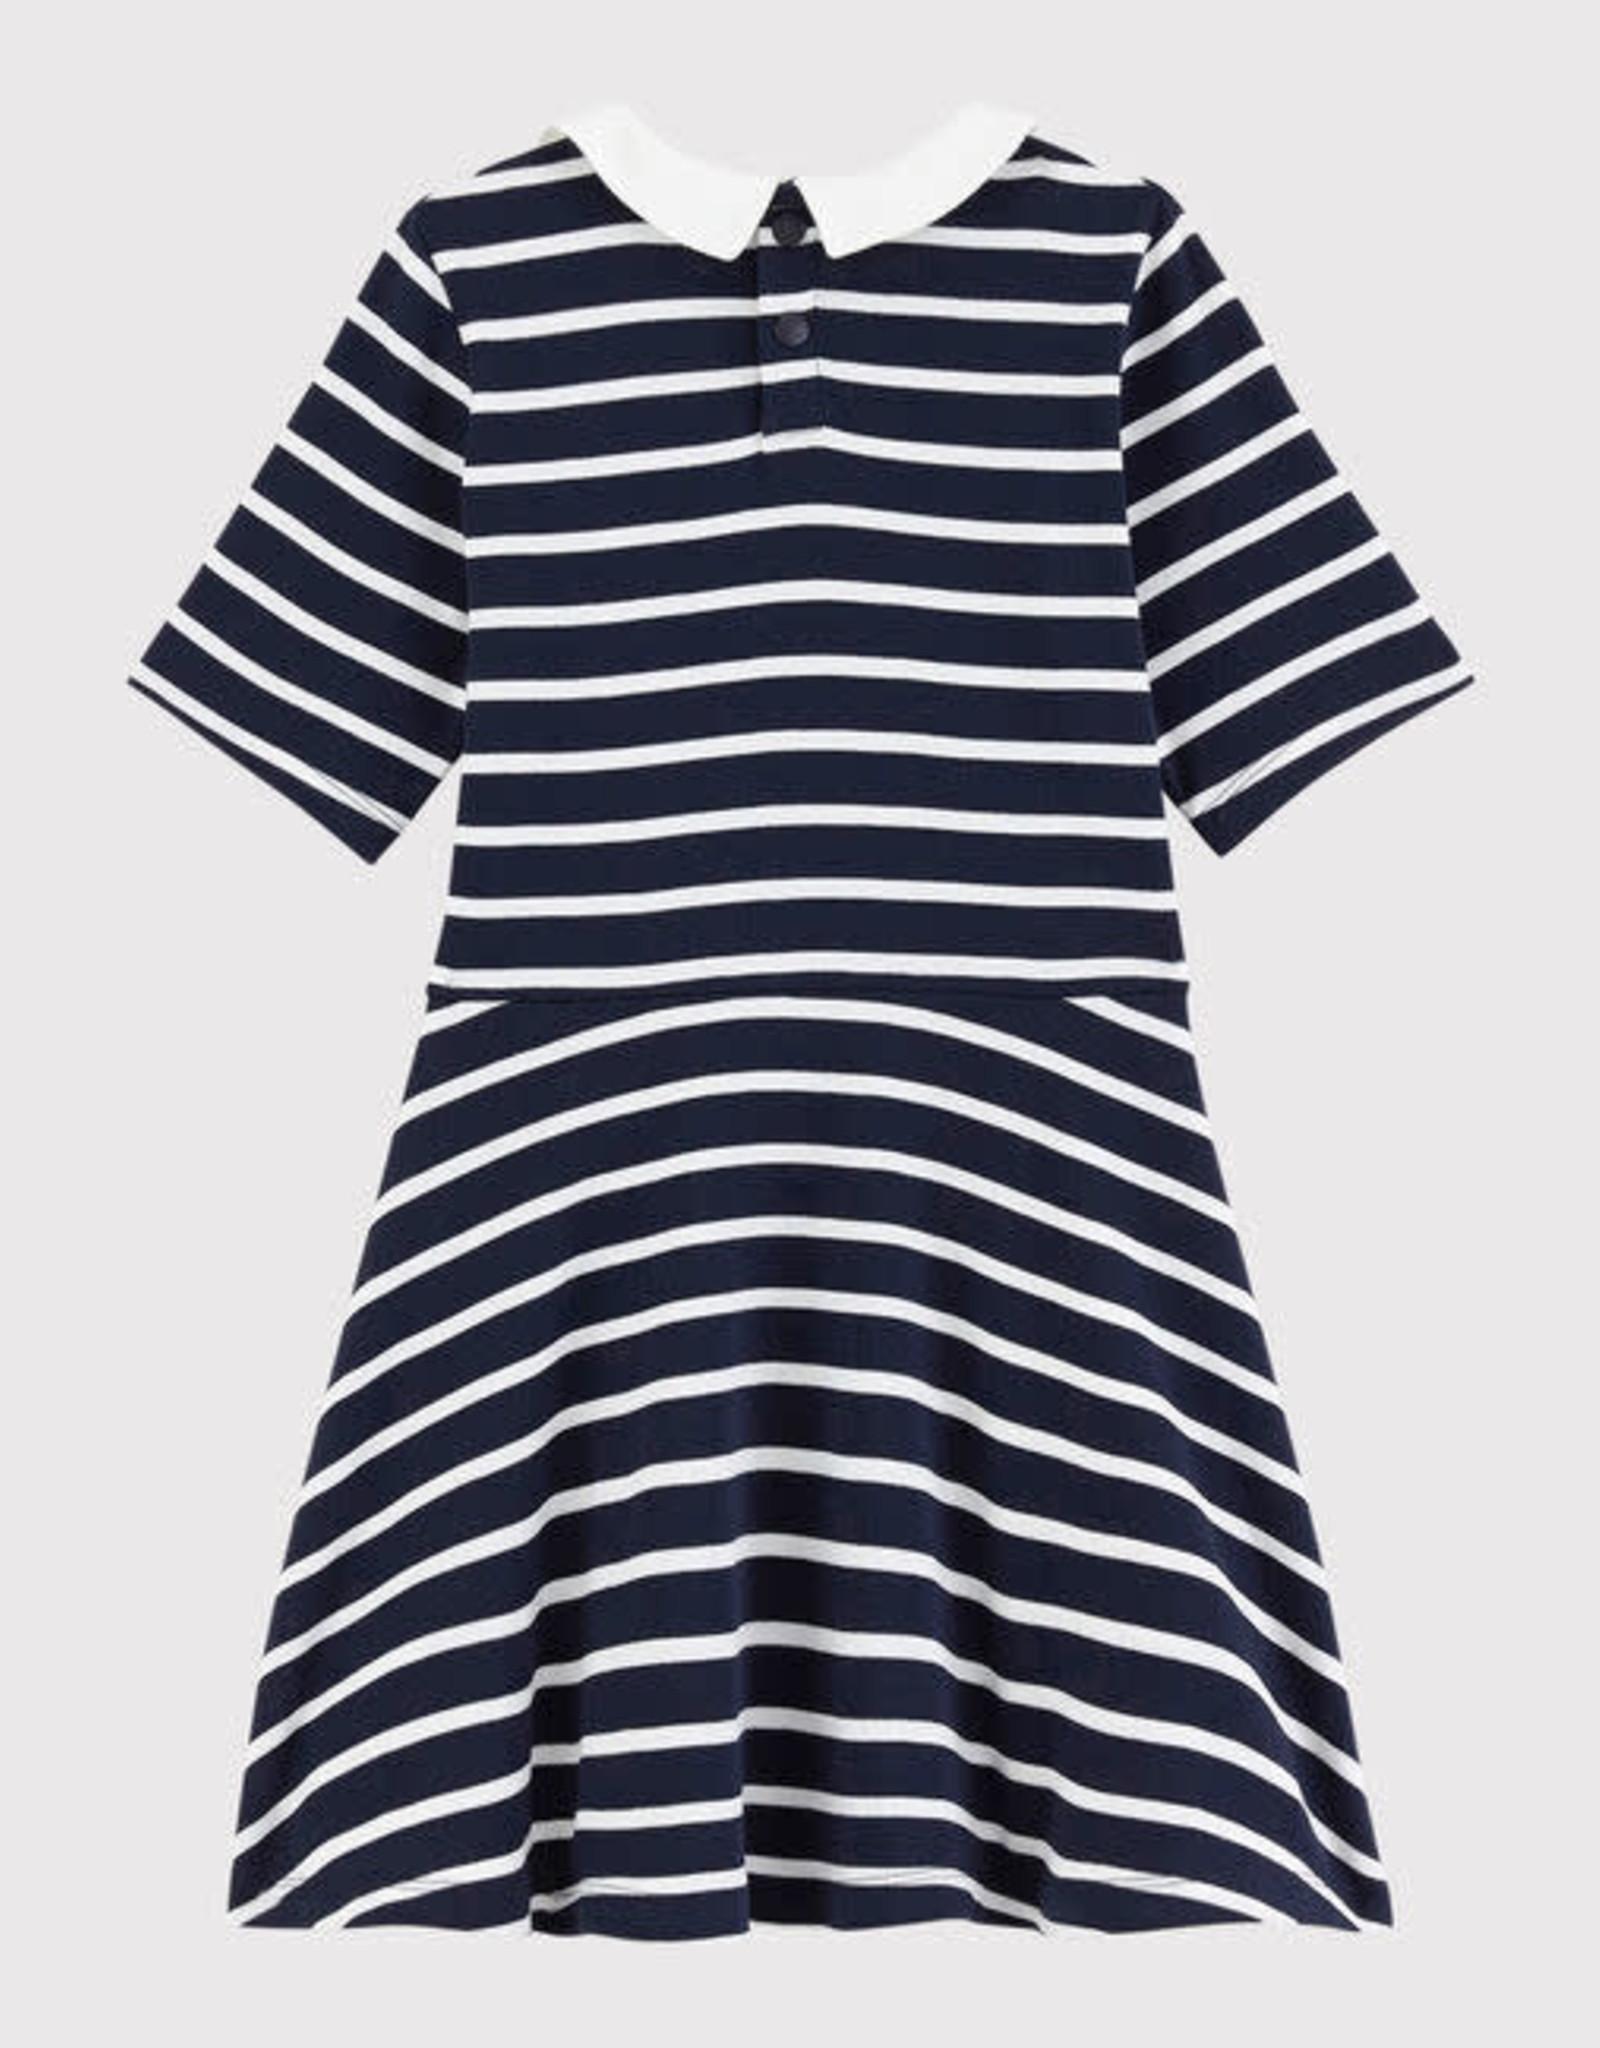 Petit Bateau Dress Navy Stripe Knit with Round Collar